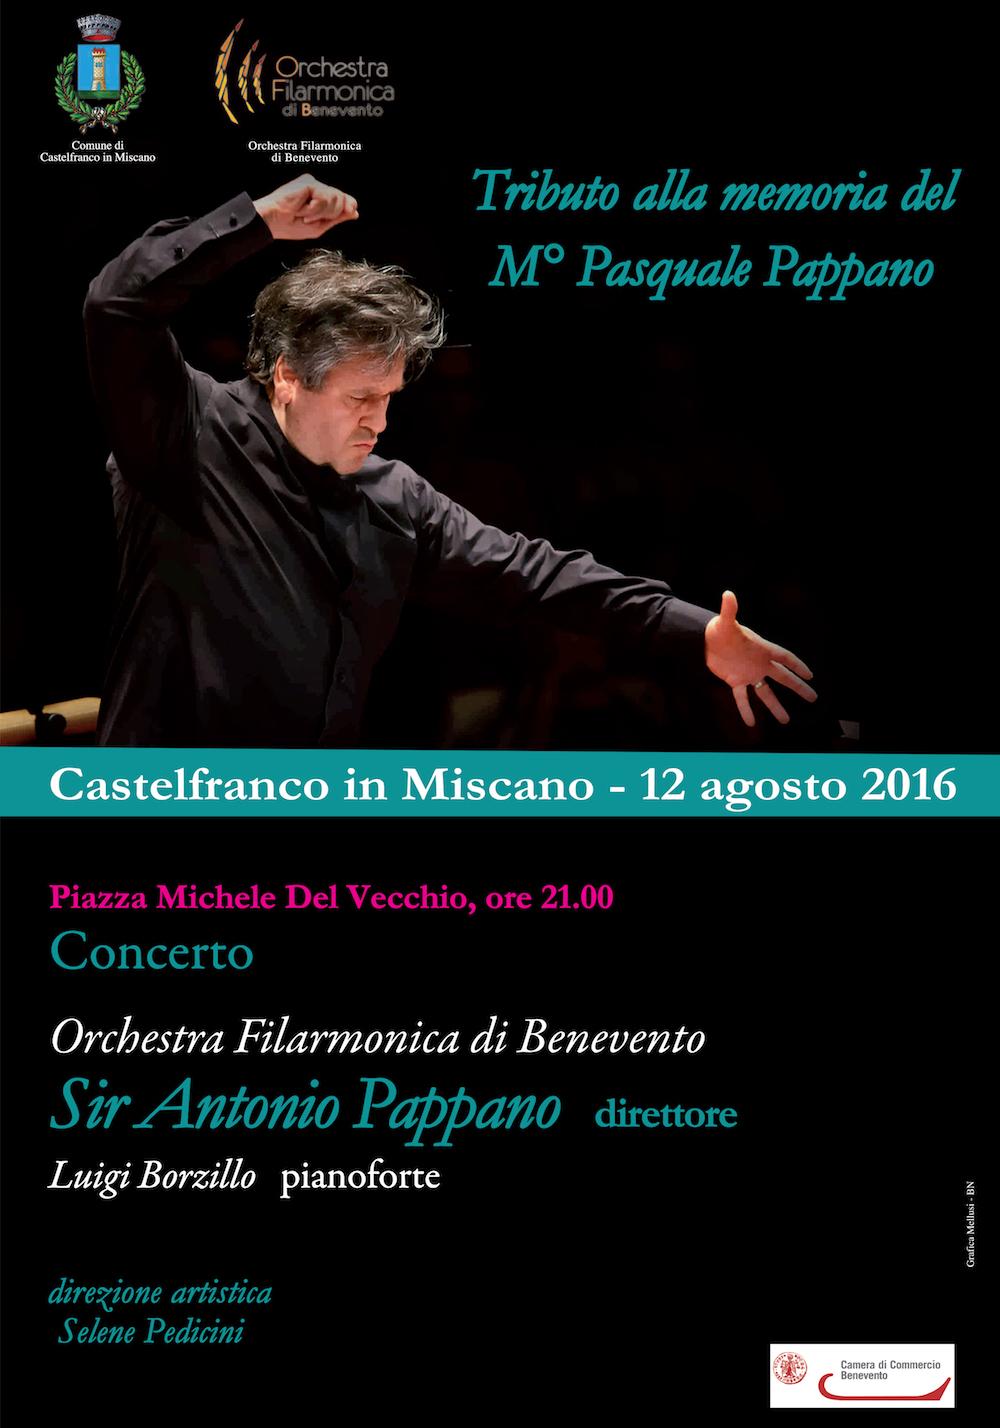 pappano manifesto 2016